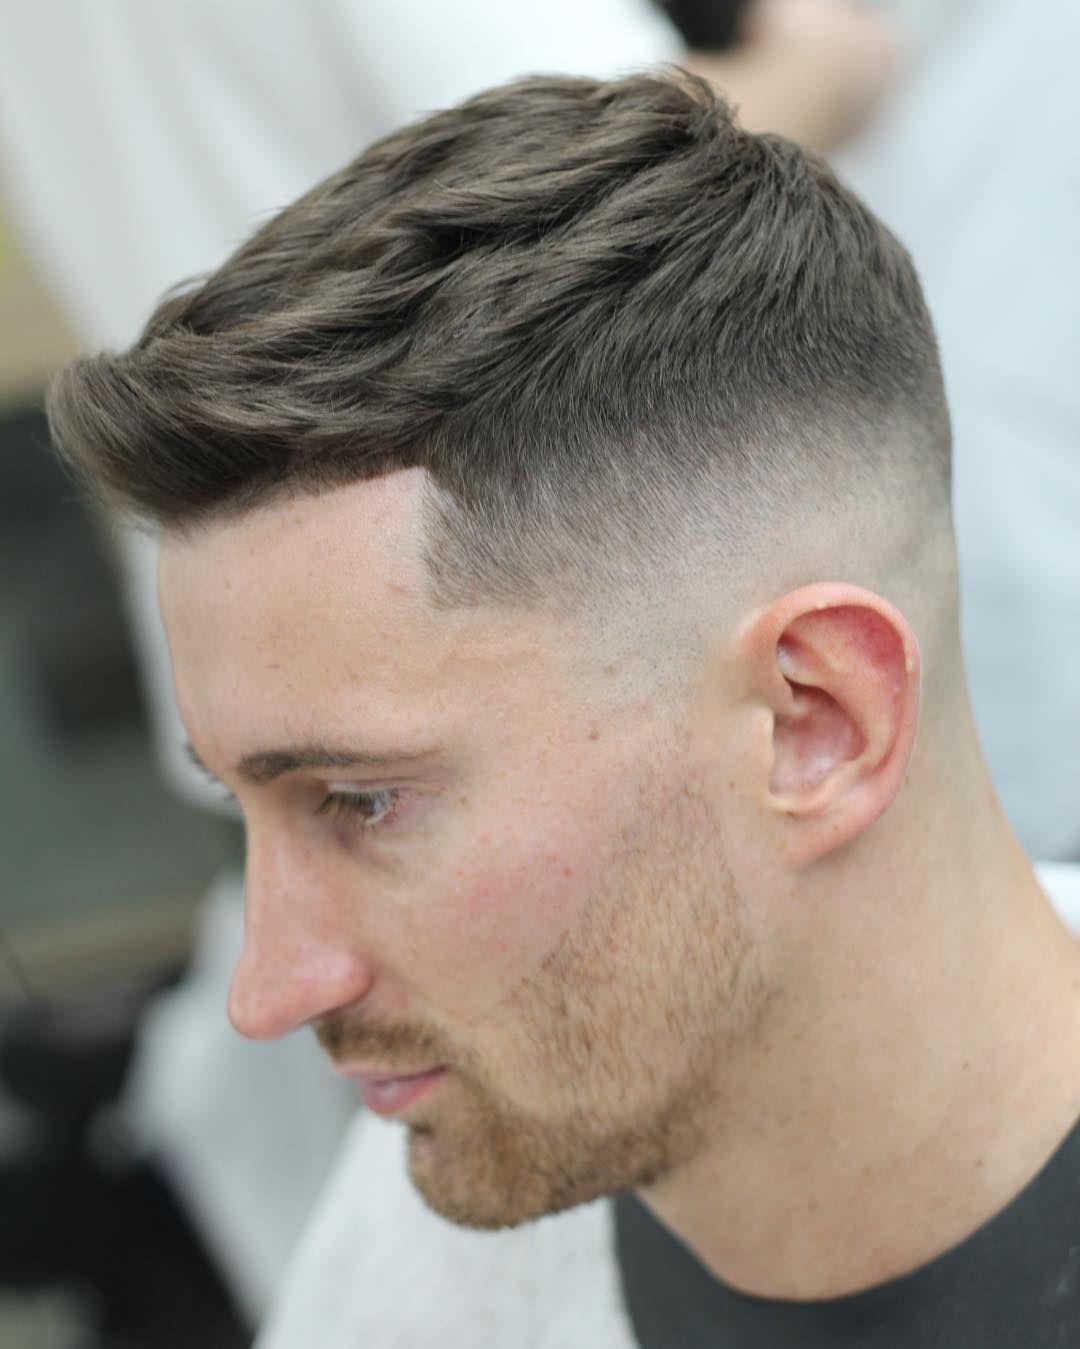 MensHairstyleTrendscom ue The best menus haircuts and cool